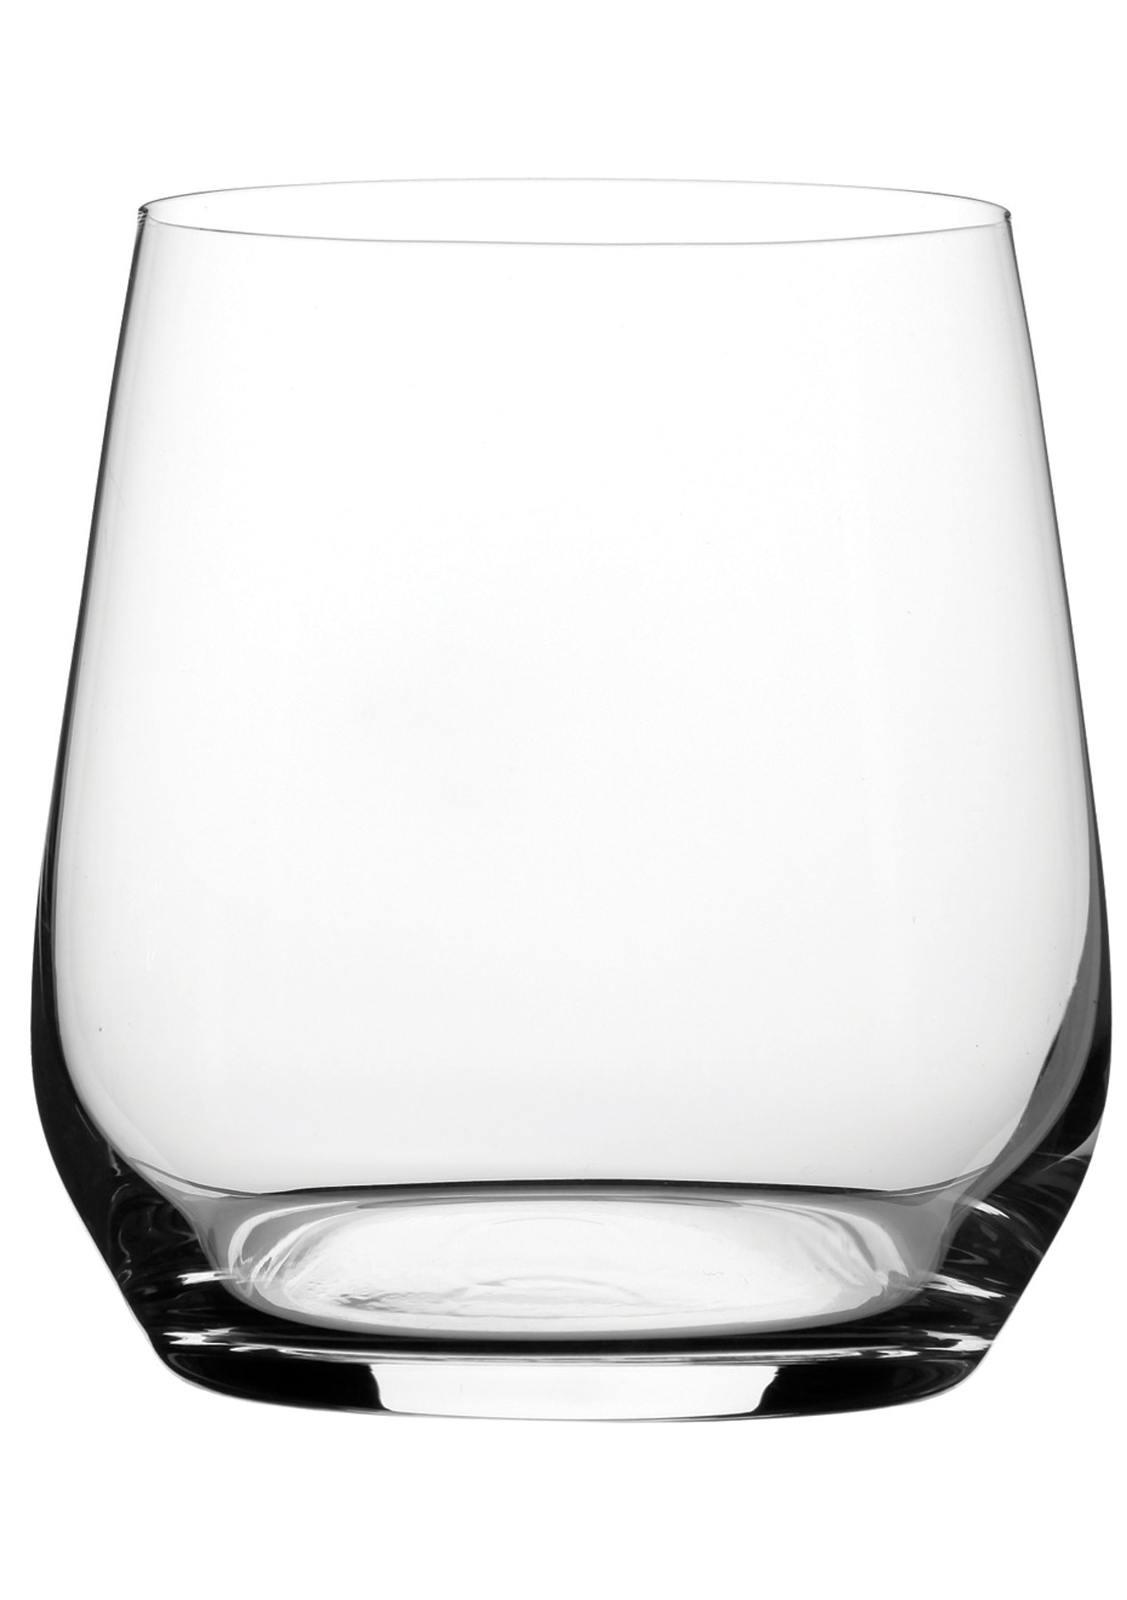 Grosvenor Stemless Wine Glasses - Set of 4 (455ml) image